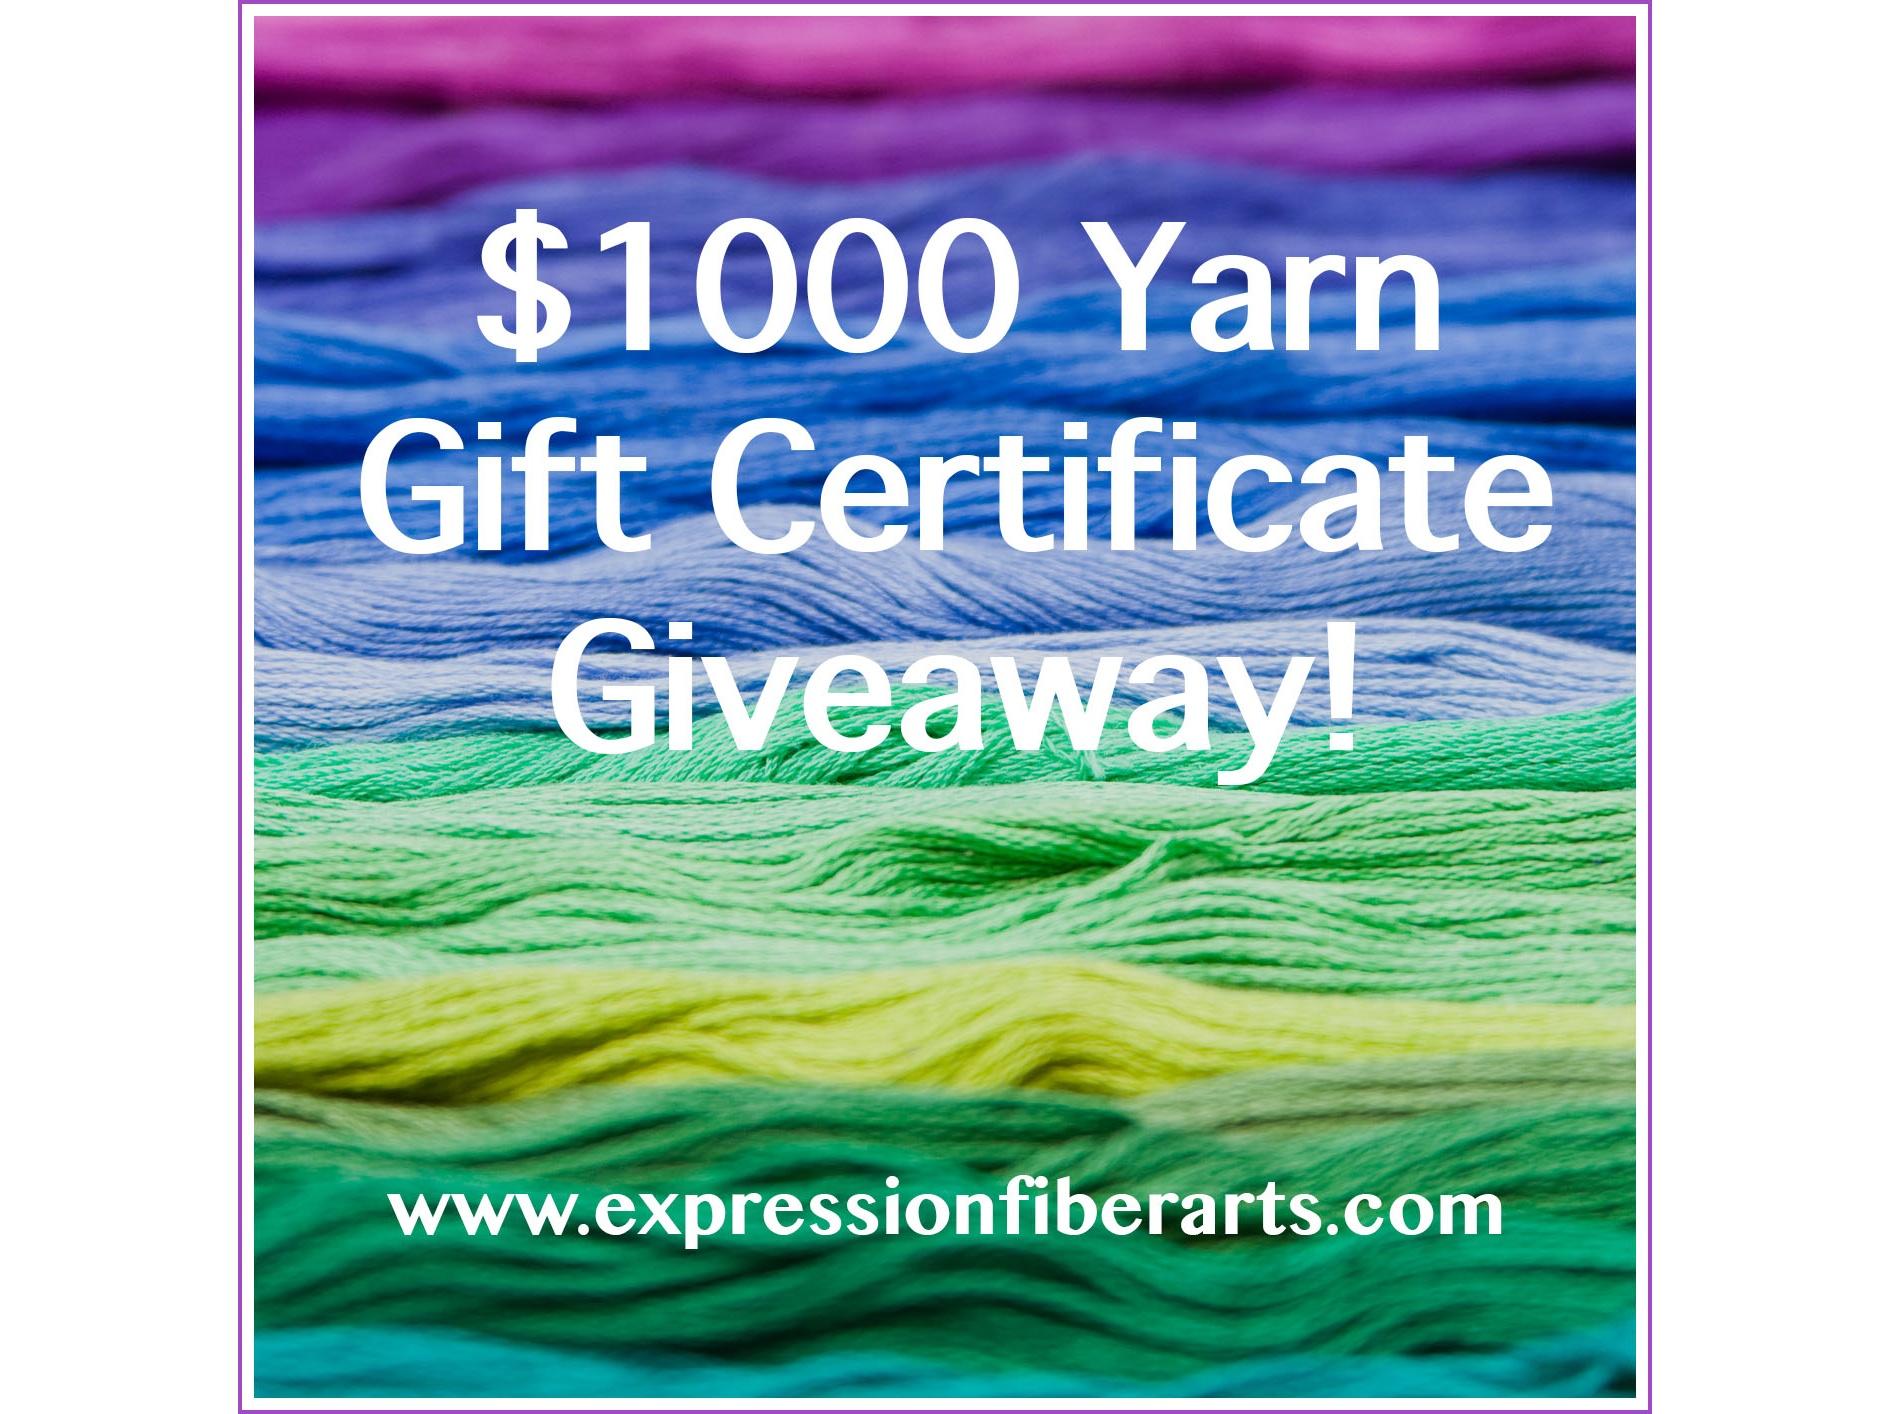 f6dacc1f51b1e0 $1000 Yarn Gift Certificate Giveaway! - Expression Fiber Arts | A ...